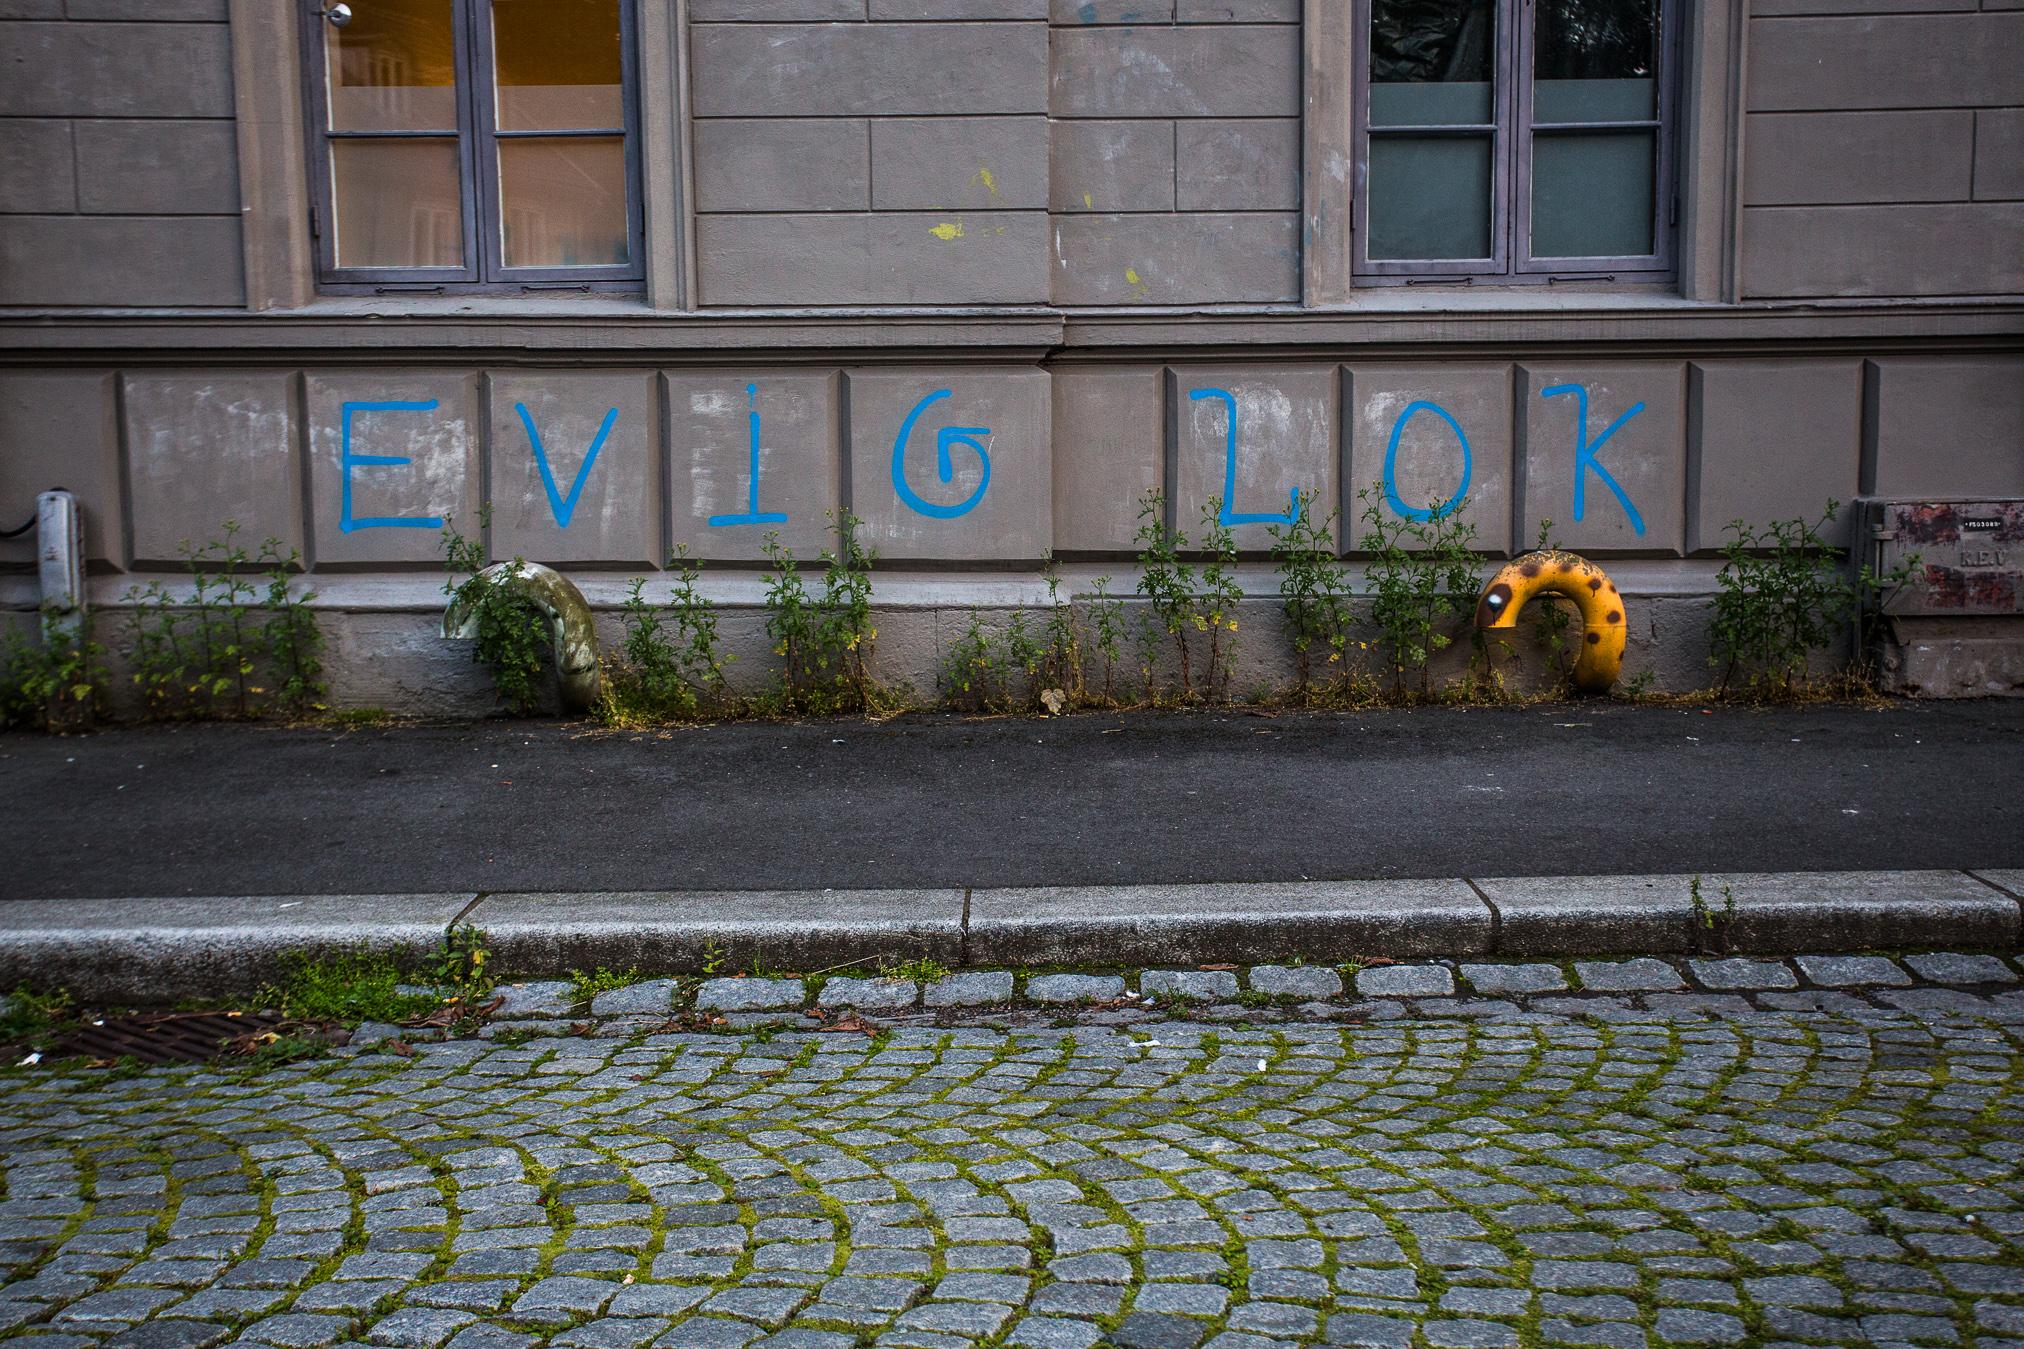 060815_fausko_oslo_damstredet_cityscape-3.jpg